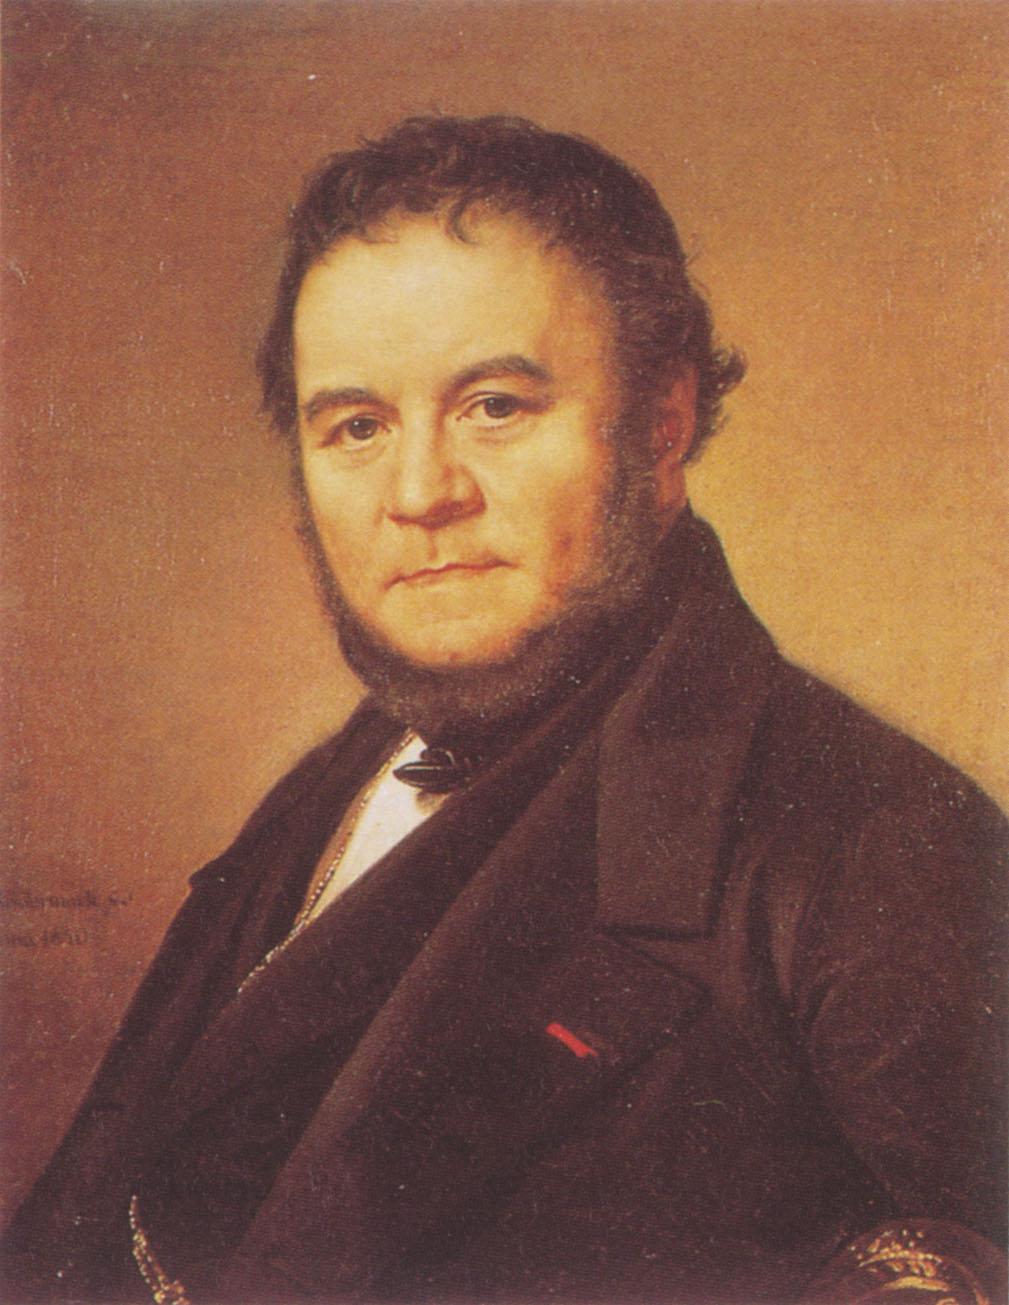 Stendhal-Stendhal-dipinto-di-Olof-Johan-Södermark-1790-1848 (1)